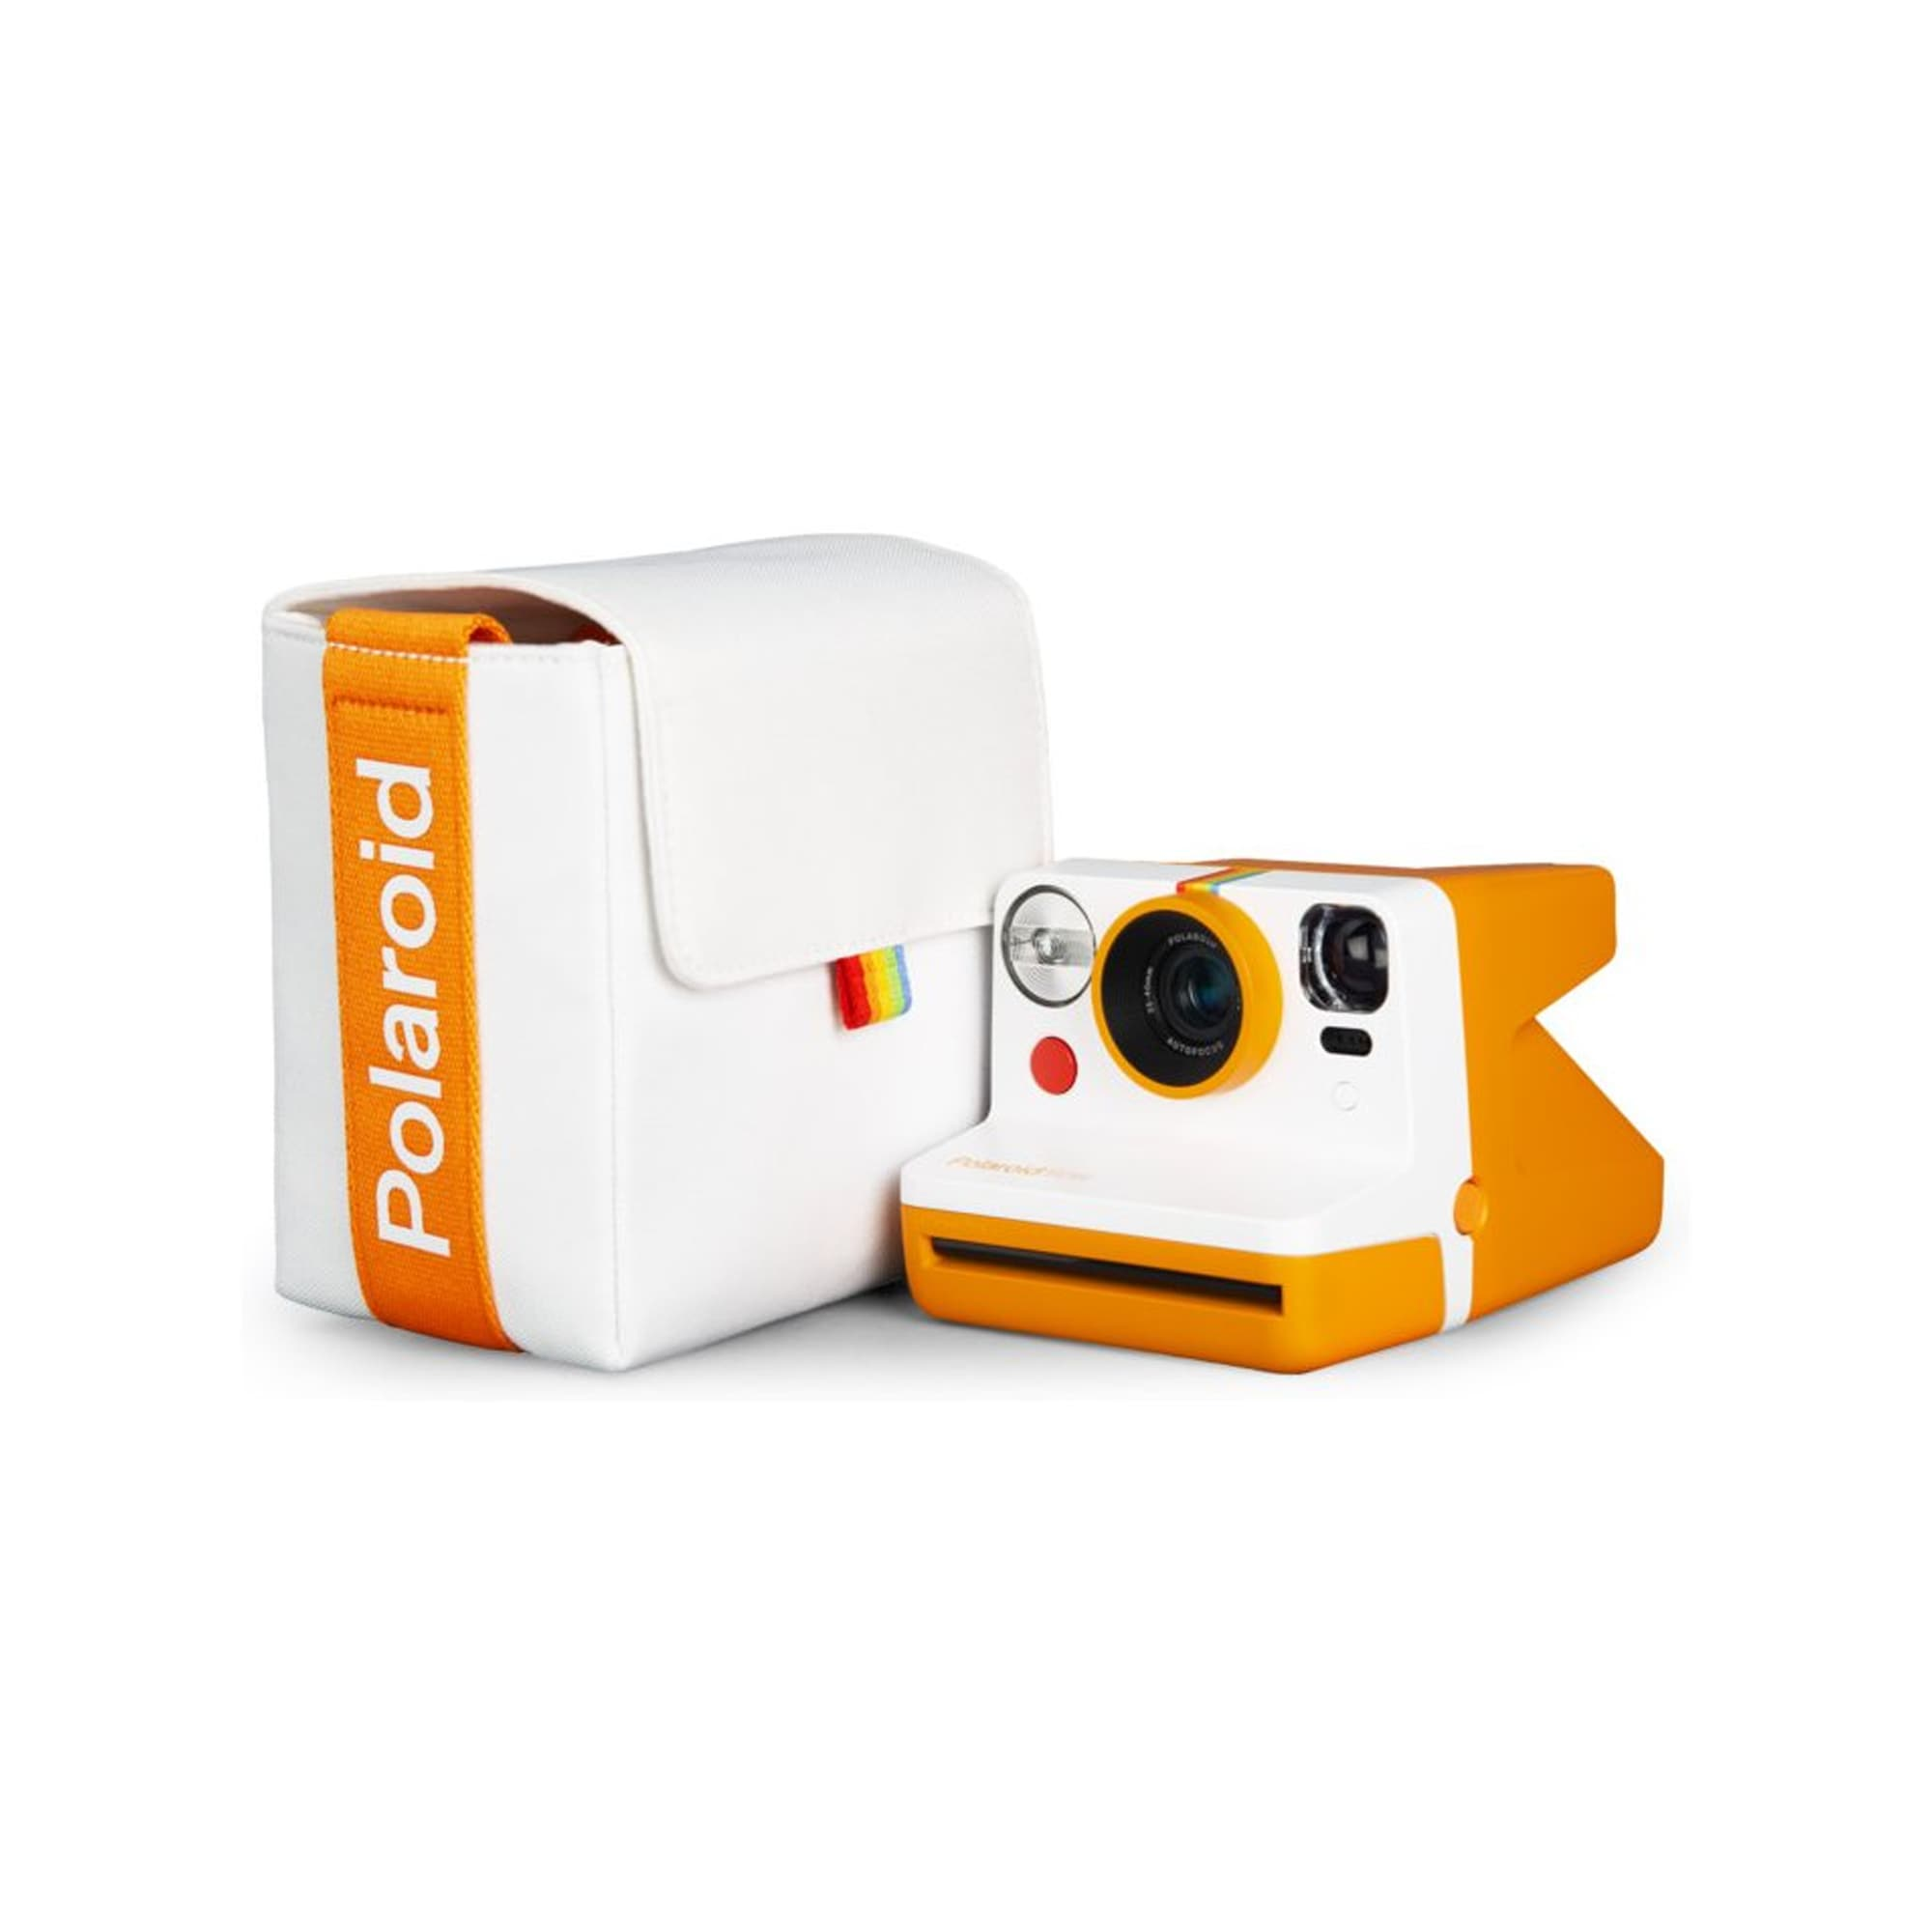 Polaroid Väska Till Now Vit & Orange